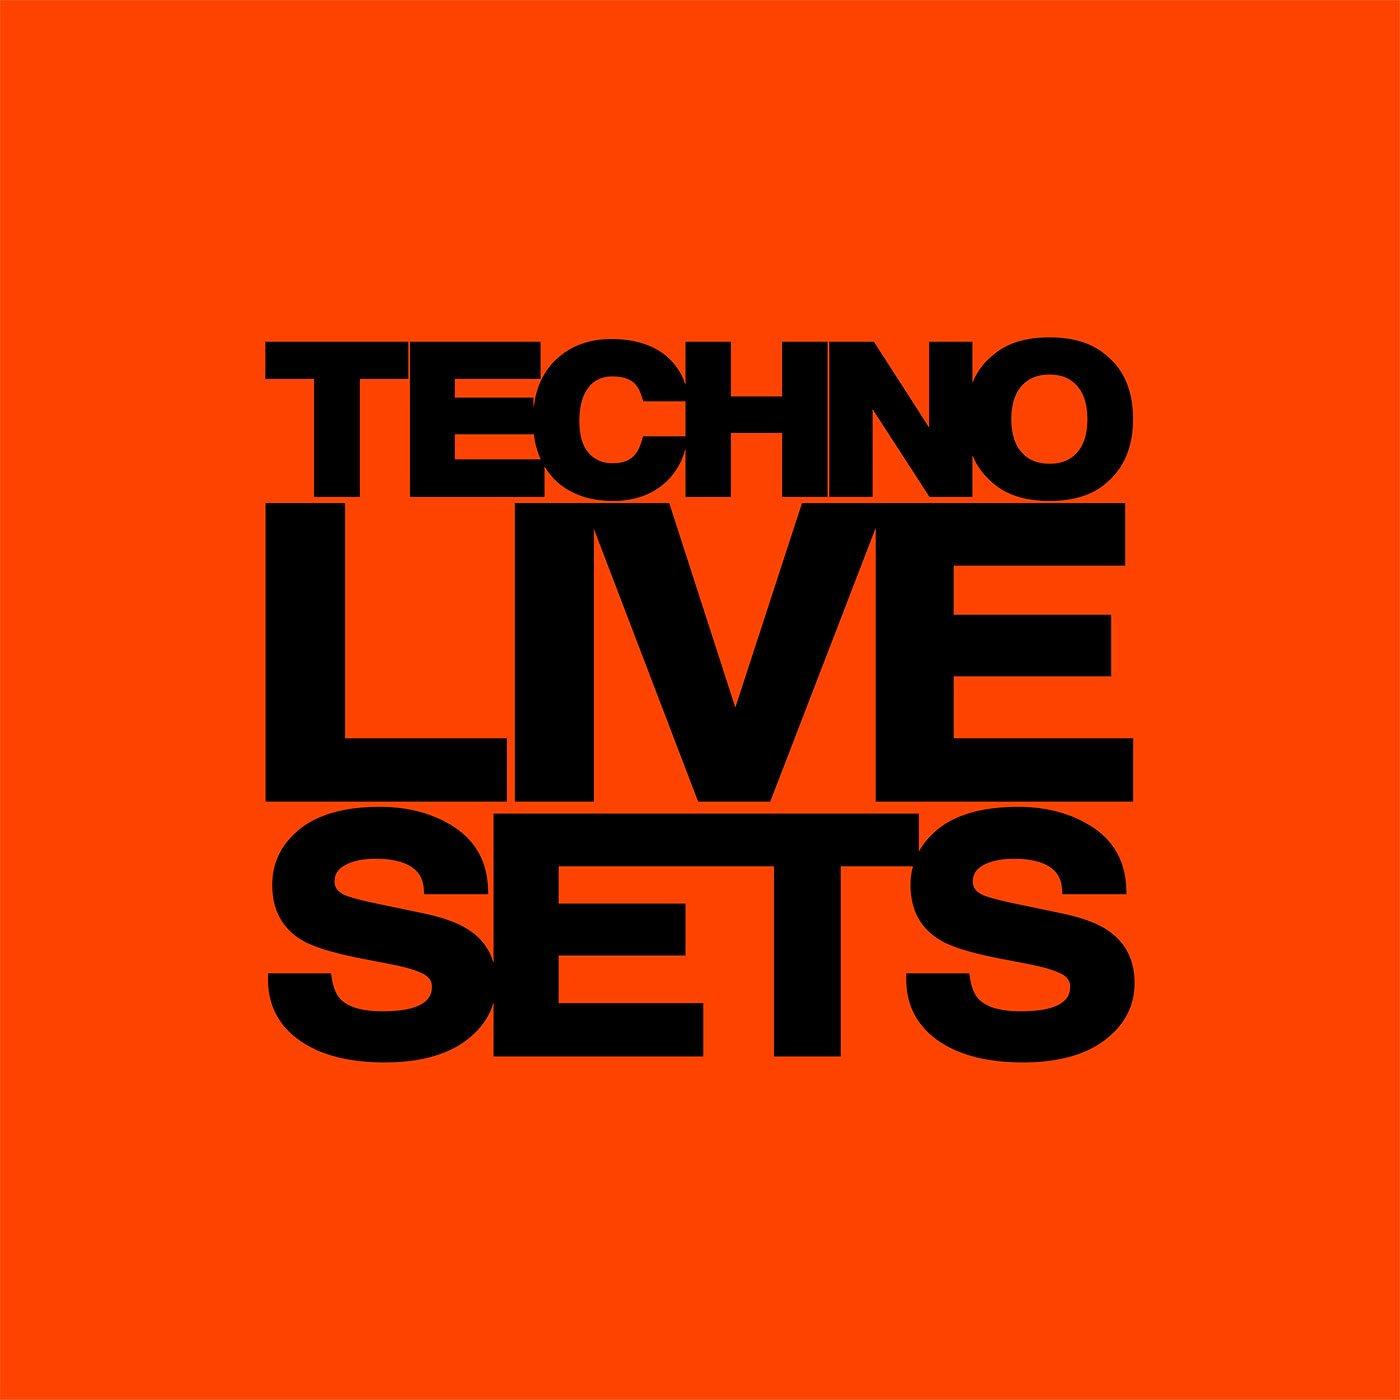 techno-live-sets-logo-iTunes